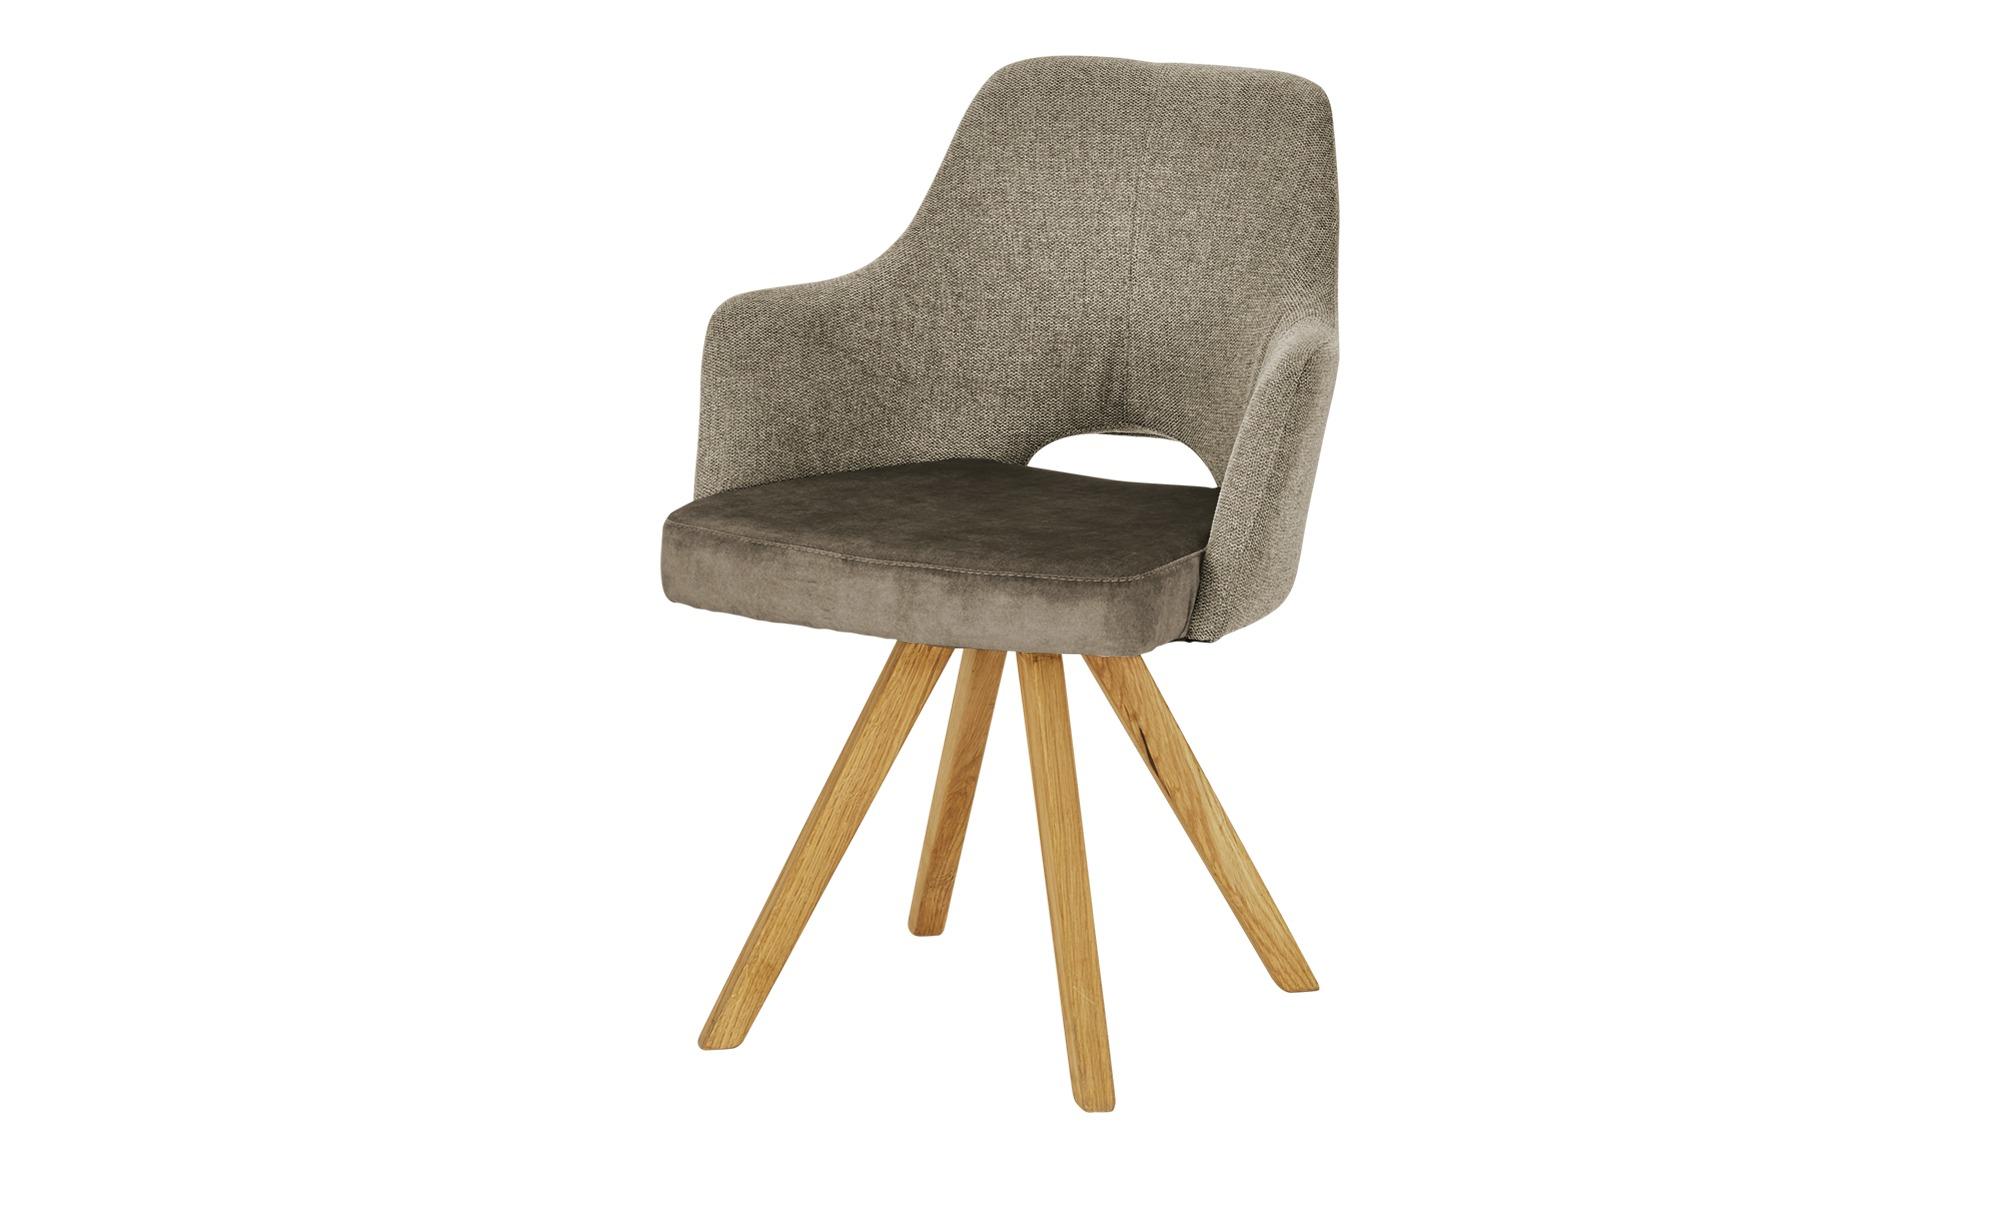 Woodford Polsterstuhl Moreda braun 58 cm 82 cm 60 cm Stühle > Esszimmerstühle Möbel Kraft